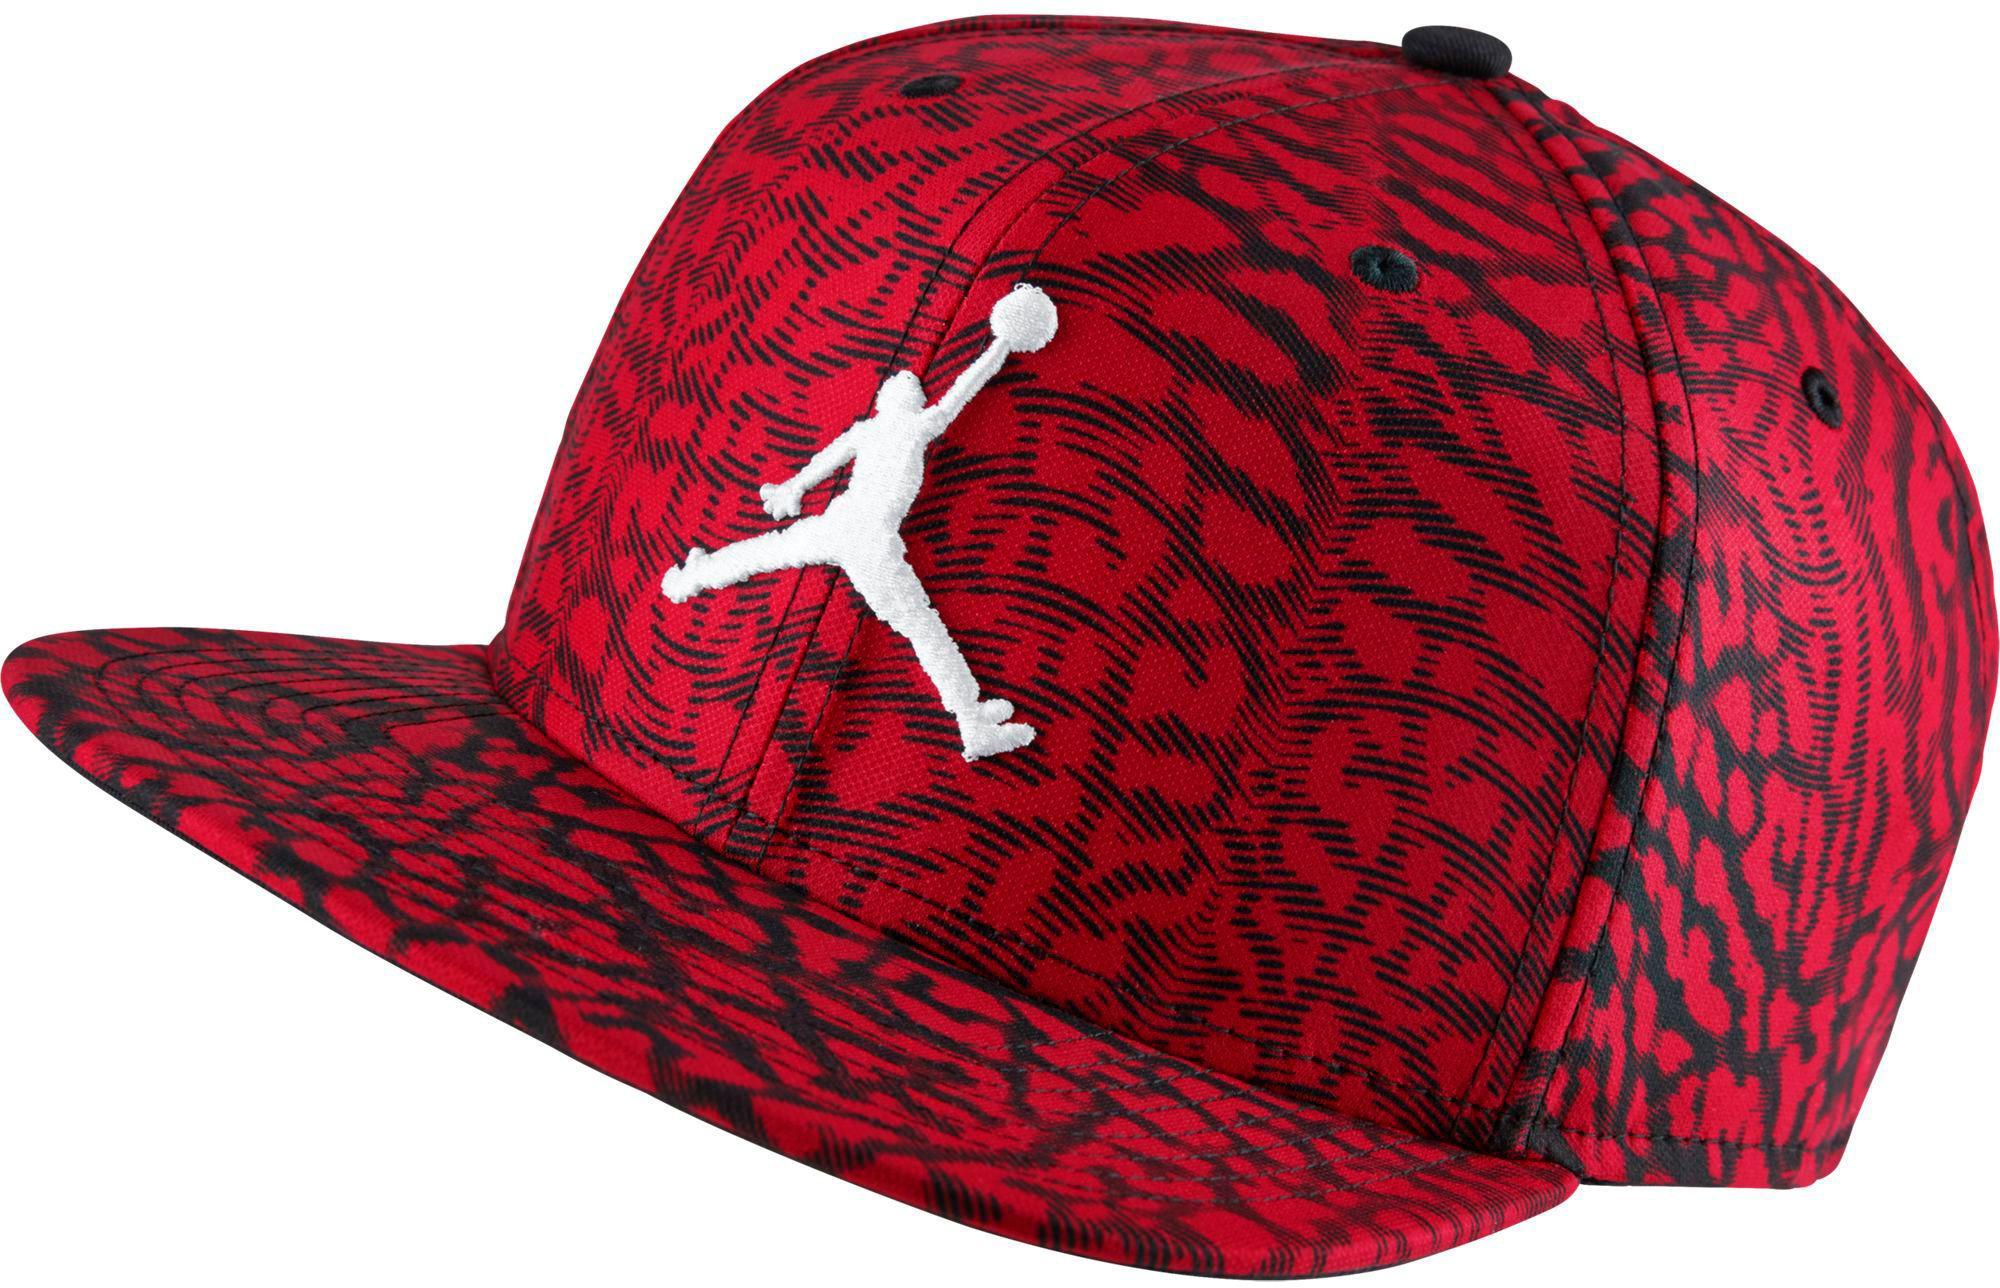 e8750d14 Nike Jordan Jumpman Seasonal Adjustable Hat in Red for Men - Lyst